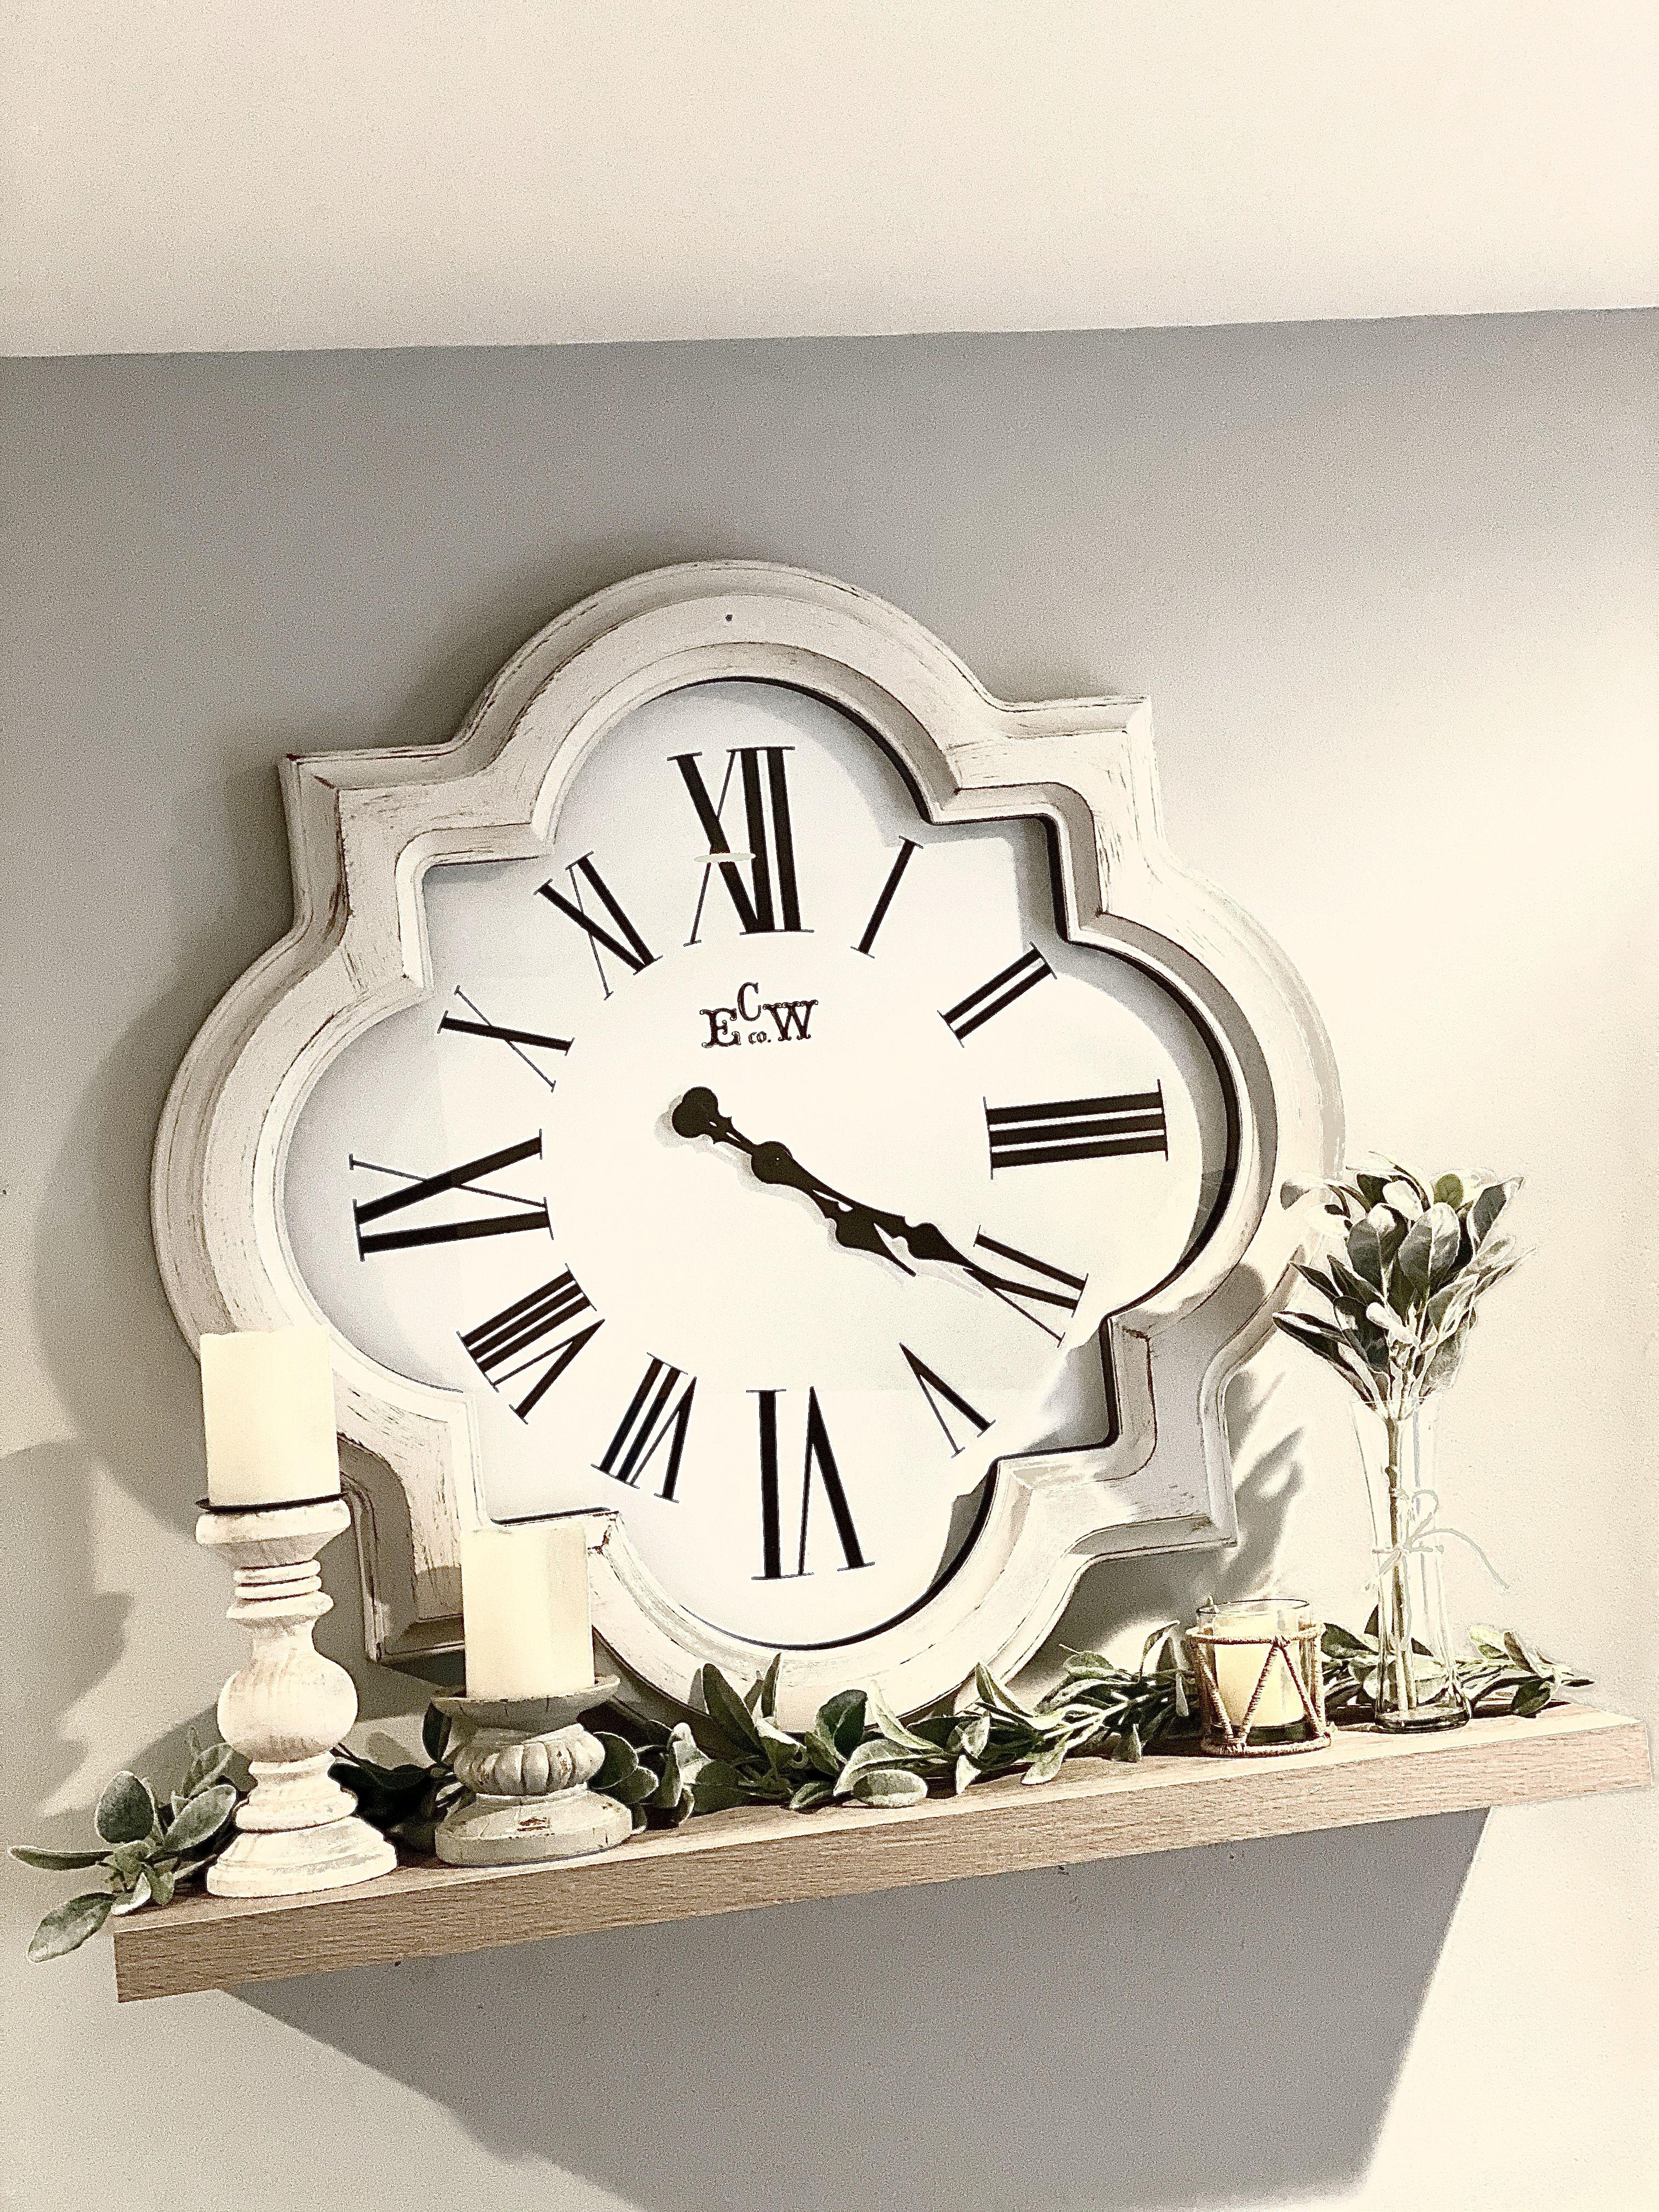 White Quatrefoil Wall Clock Hobby Lobby 1805282 In 2020 Large Wall Clock Decor Wall Clocks Living Room Large Clock Decor